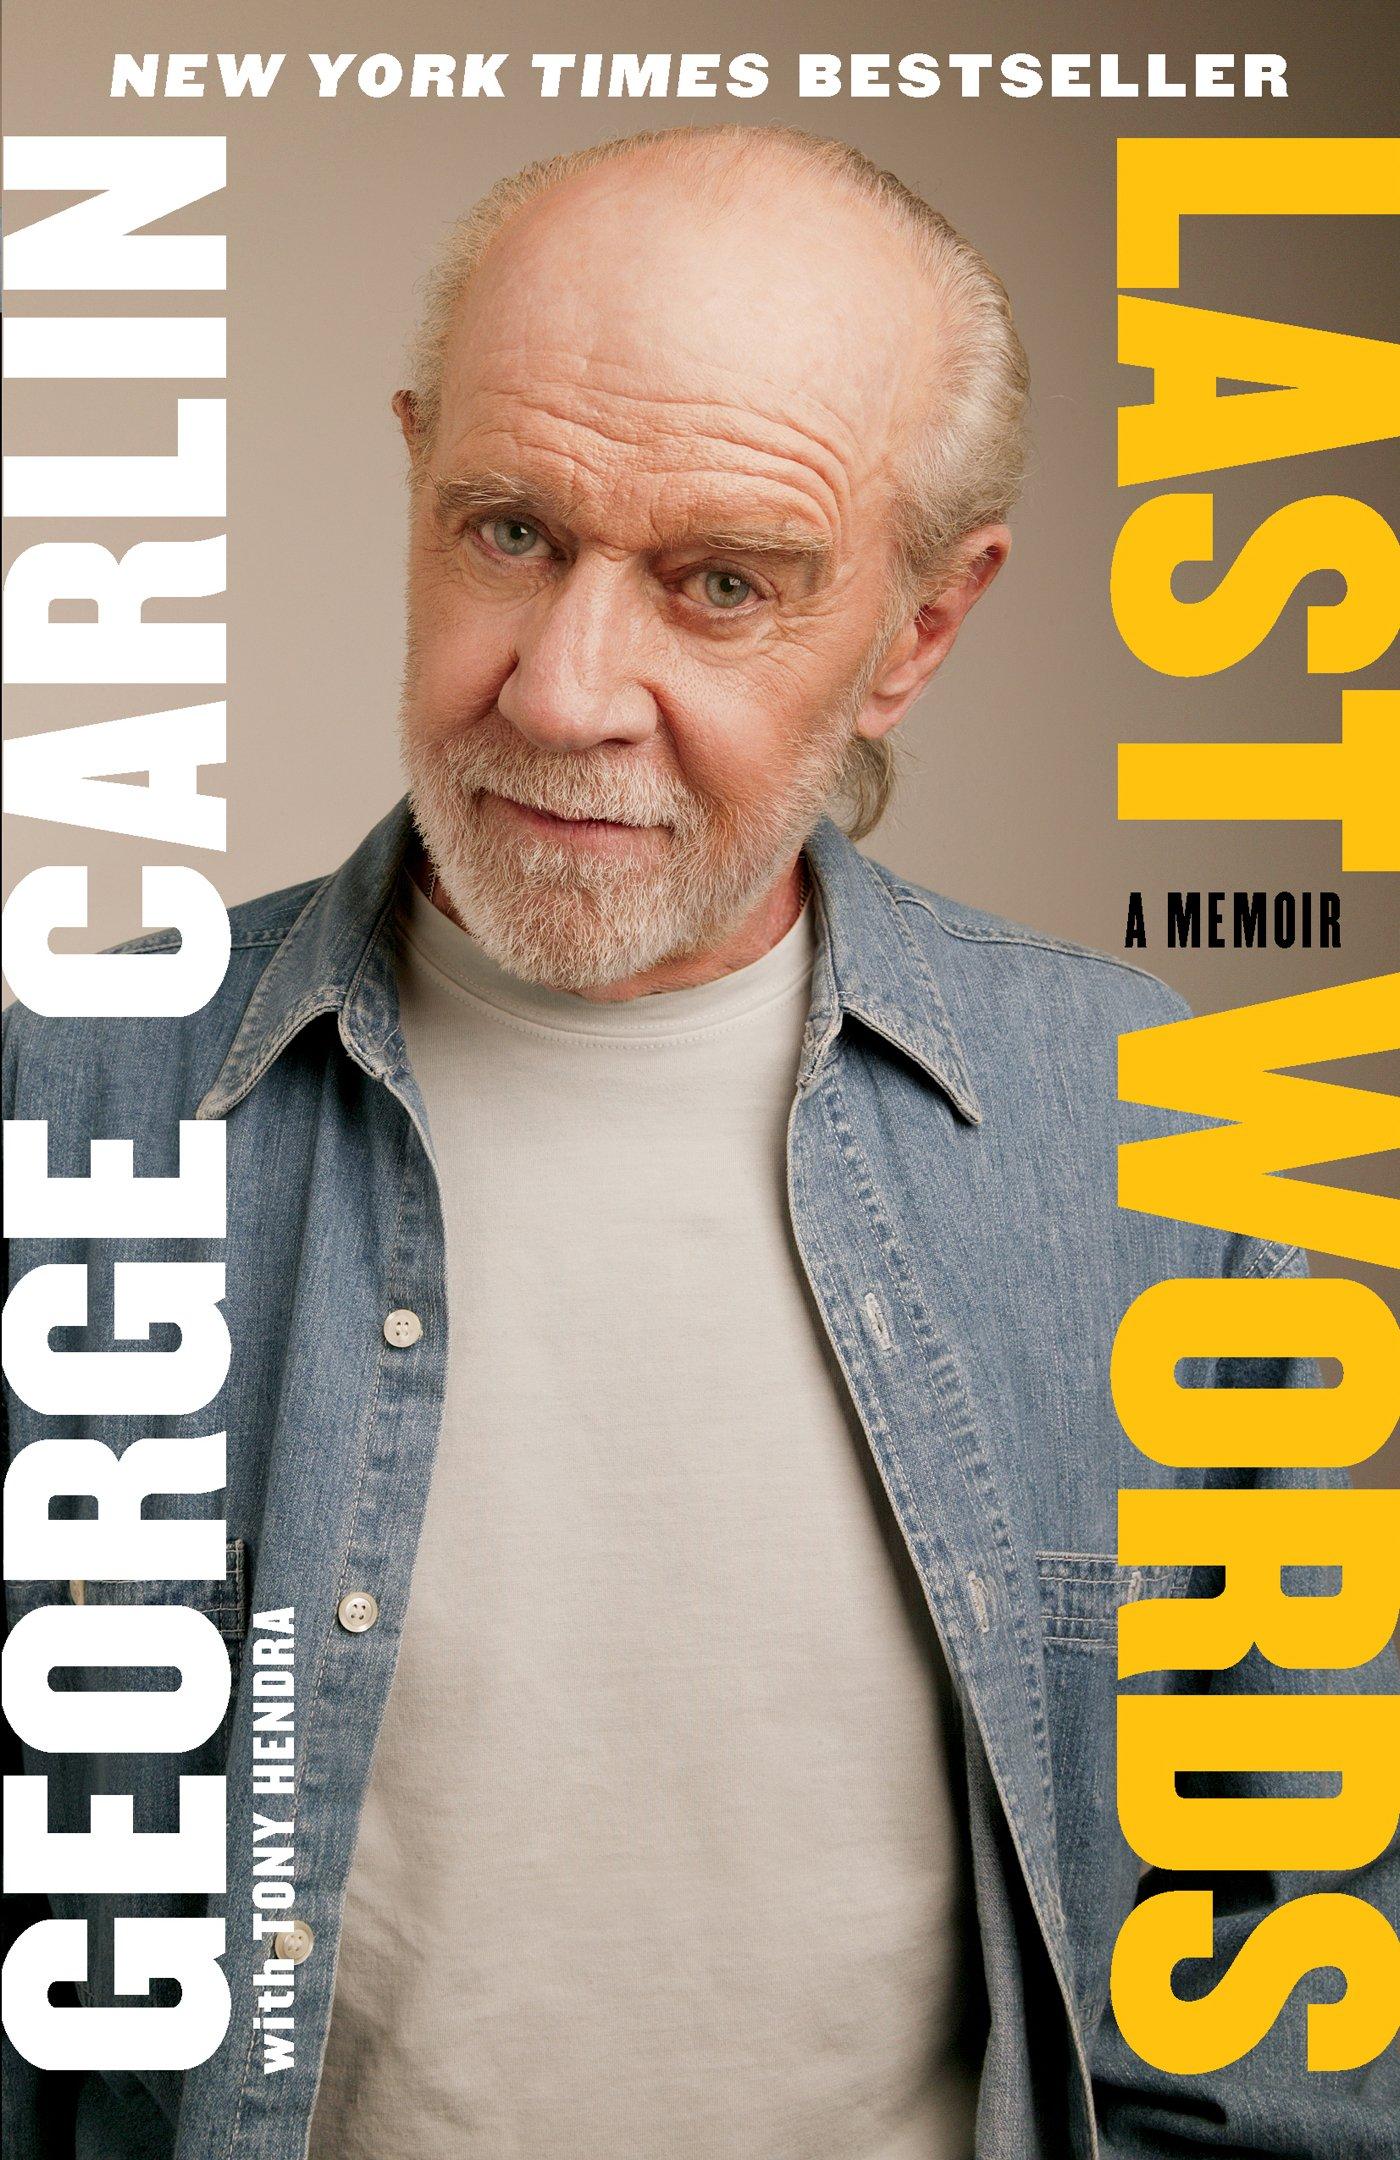 Carlin George Orgy Three Times